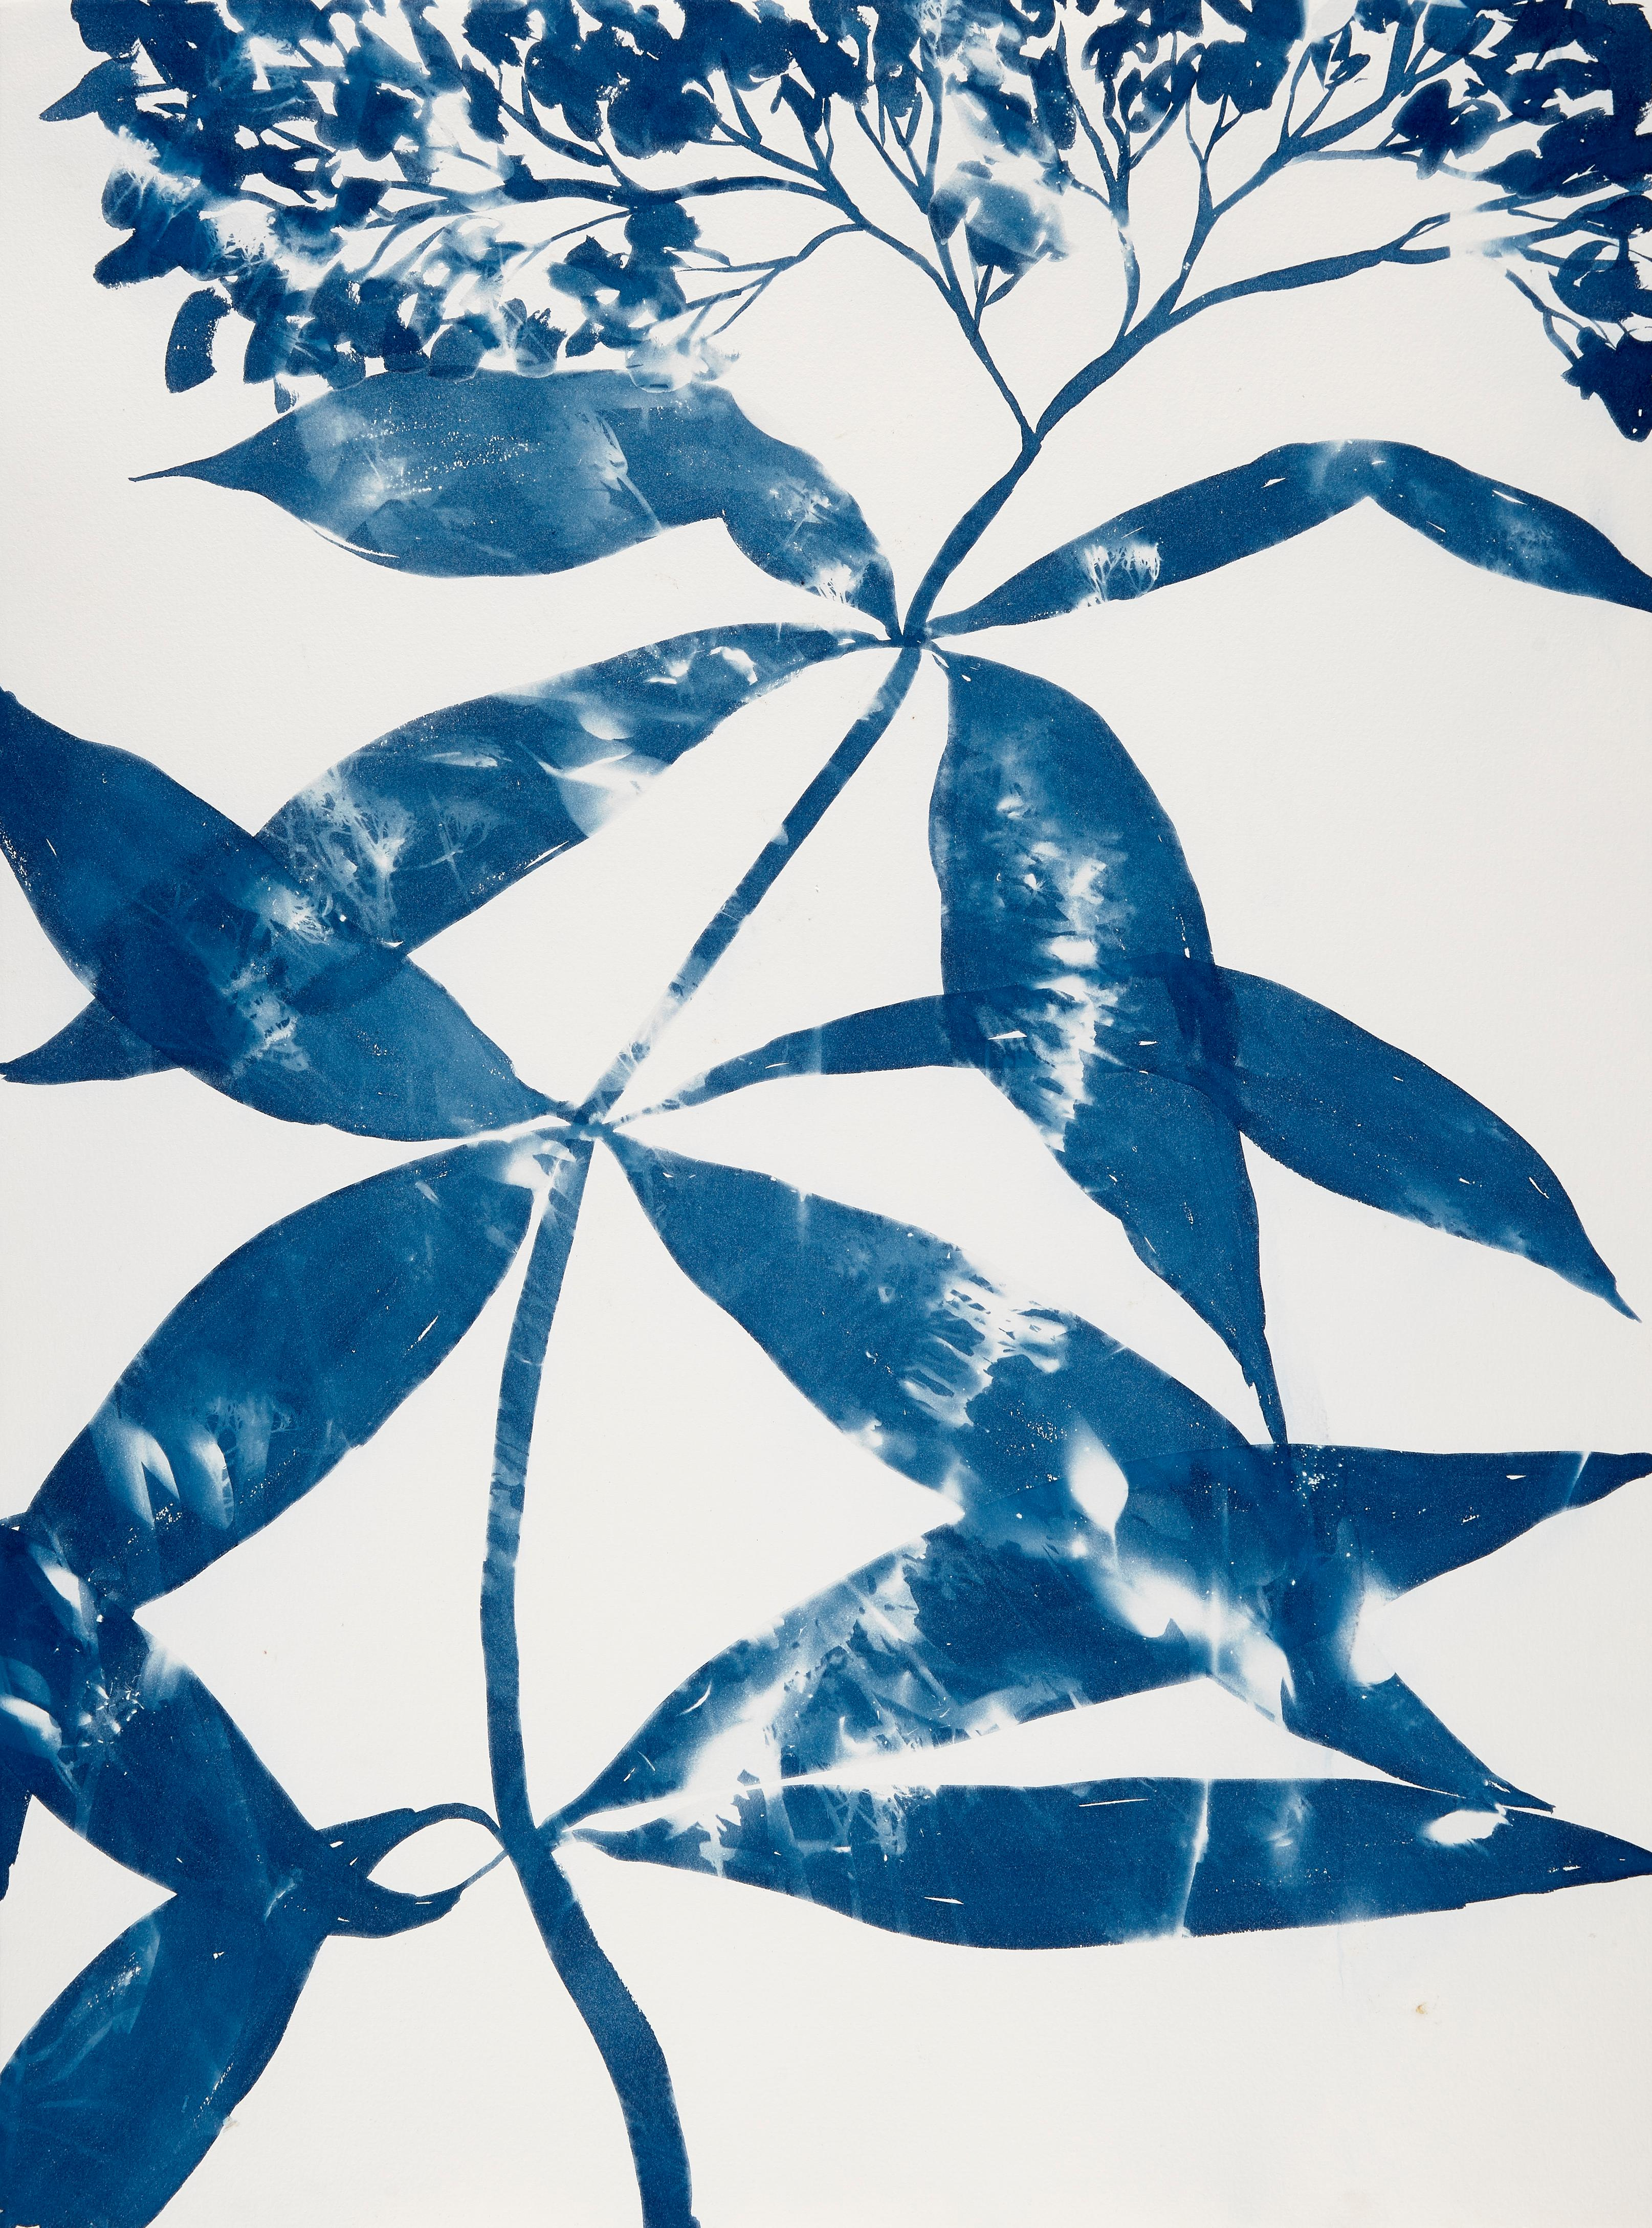 Boneset, Botanical,  Floral, Cyanotype, Blue, Work on Paper, Flowers, Nature